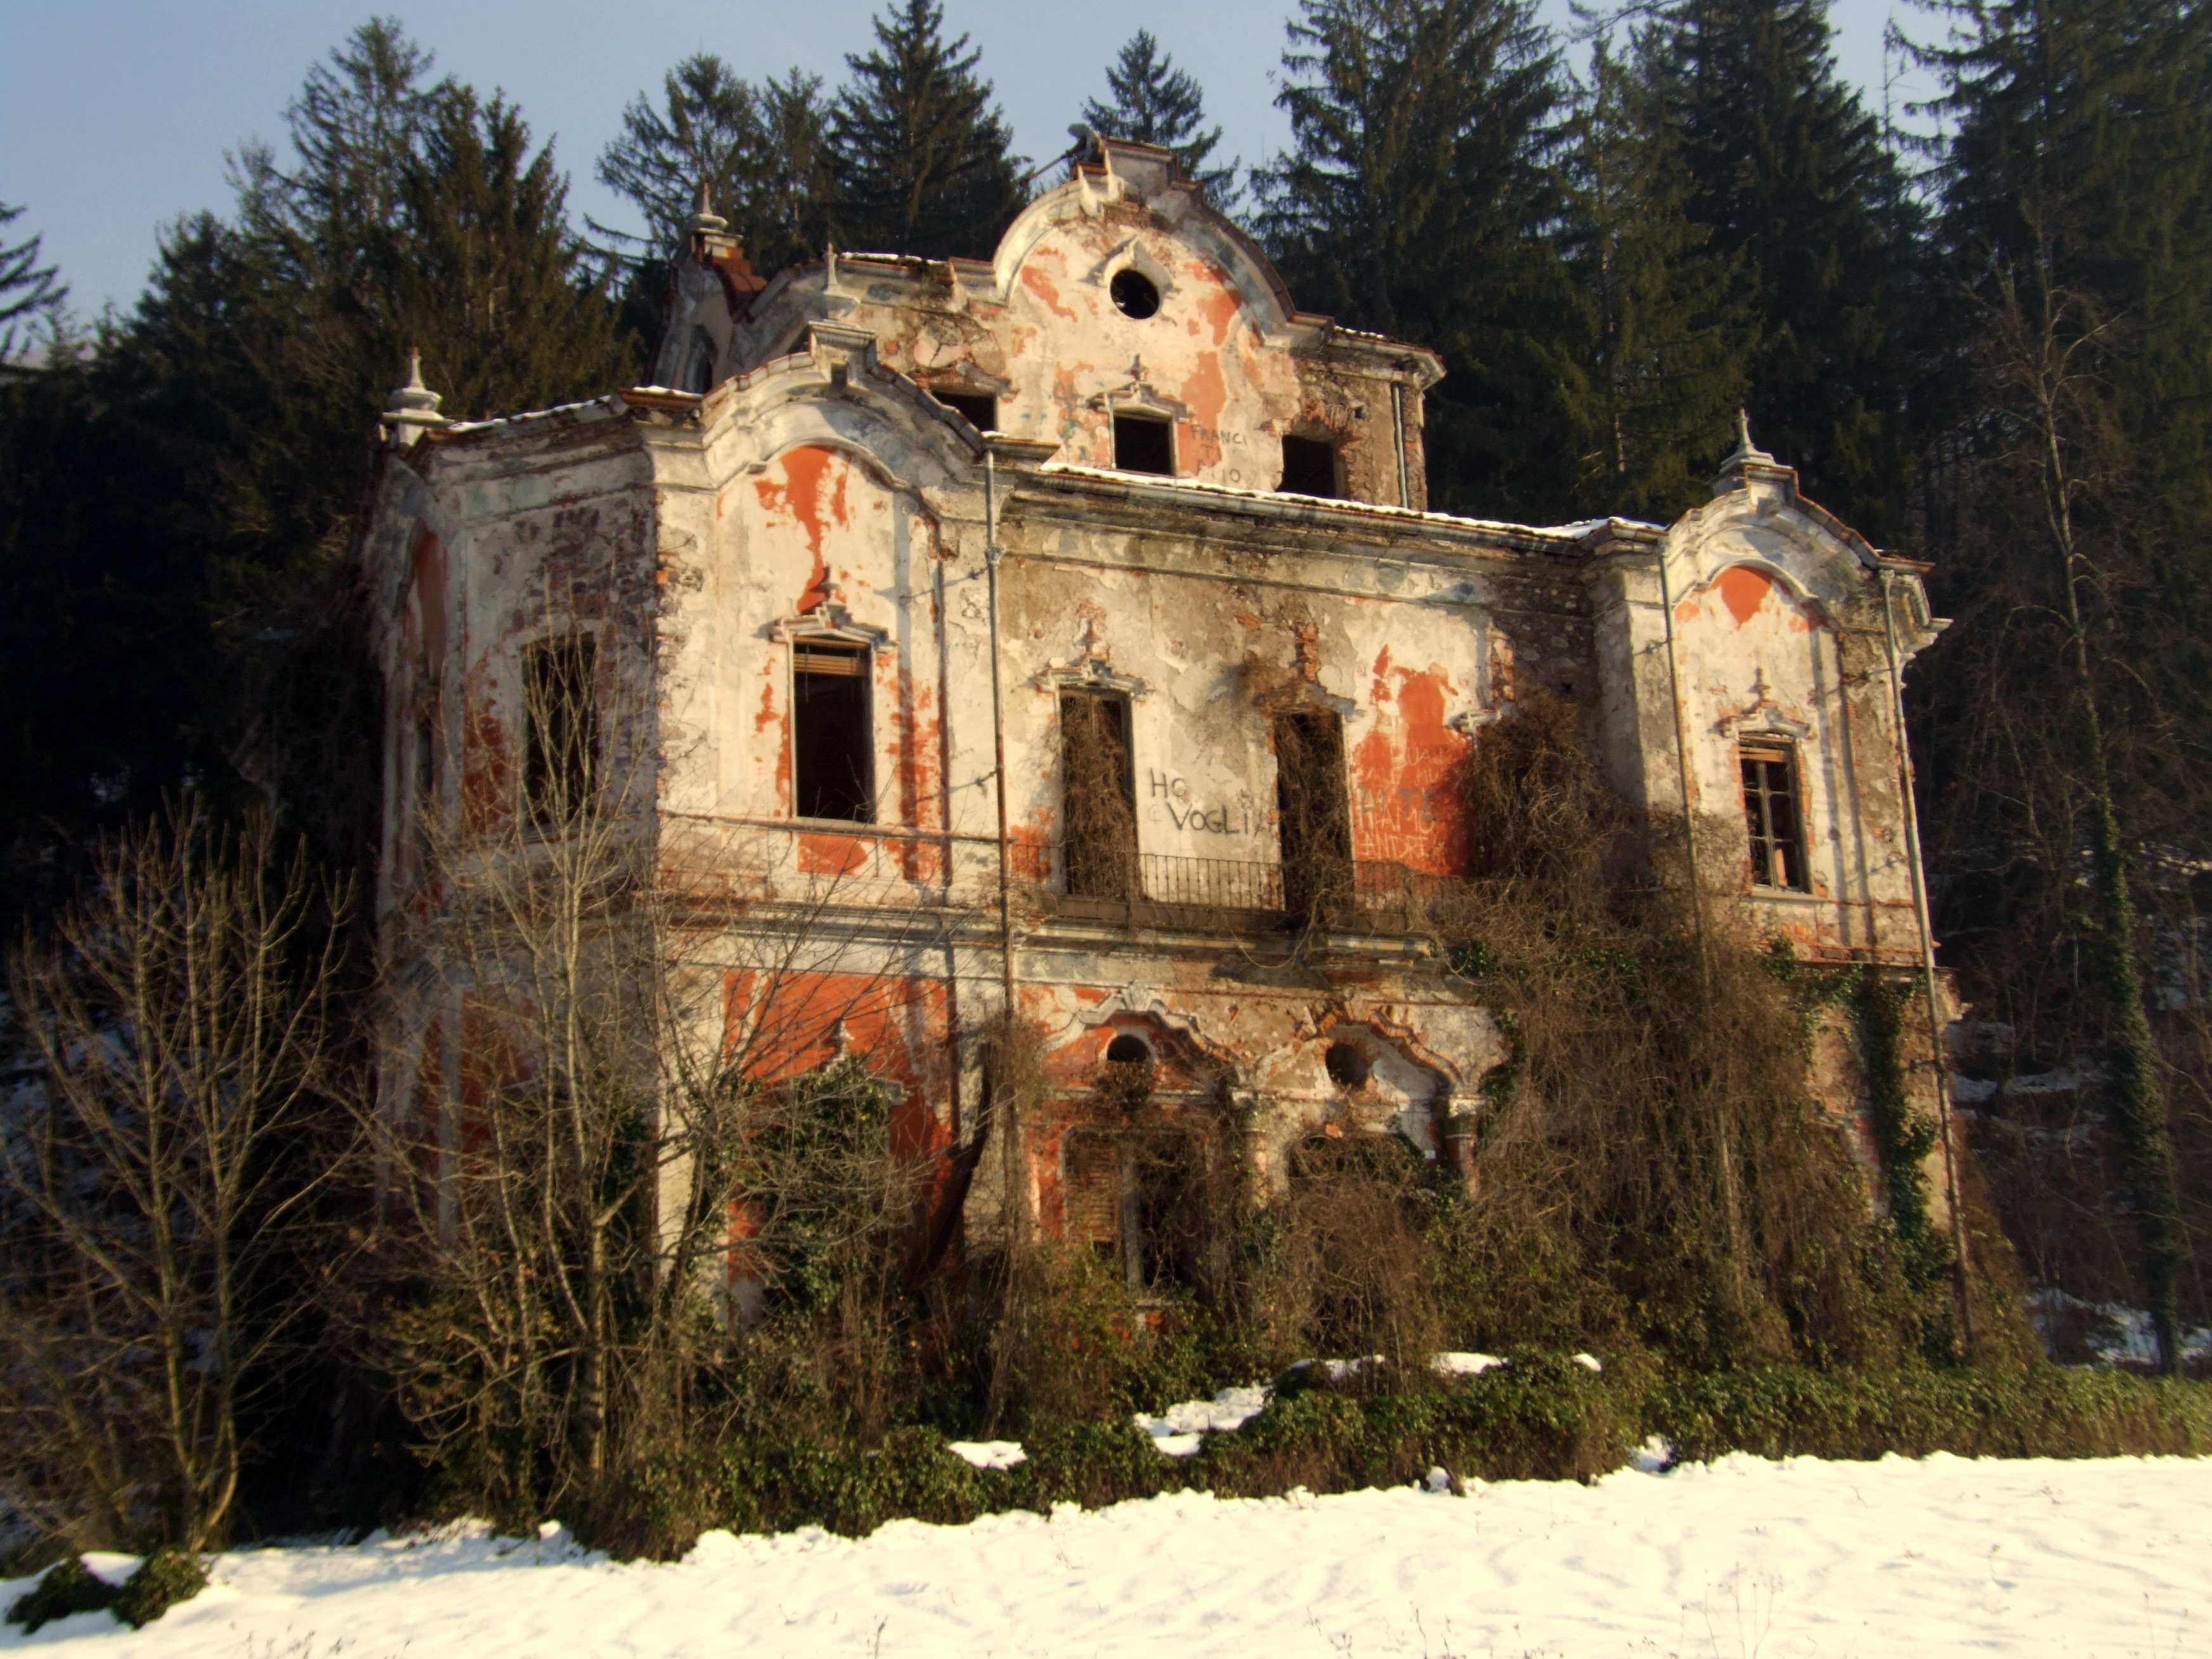 Villa De Vecchi La Casa Dei Fantasmi A Cortenova